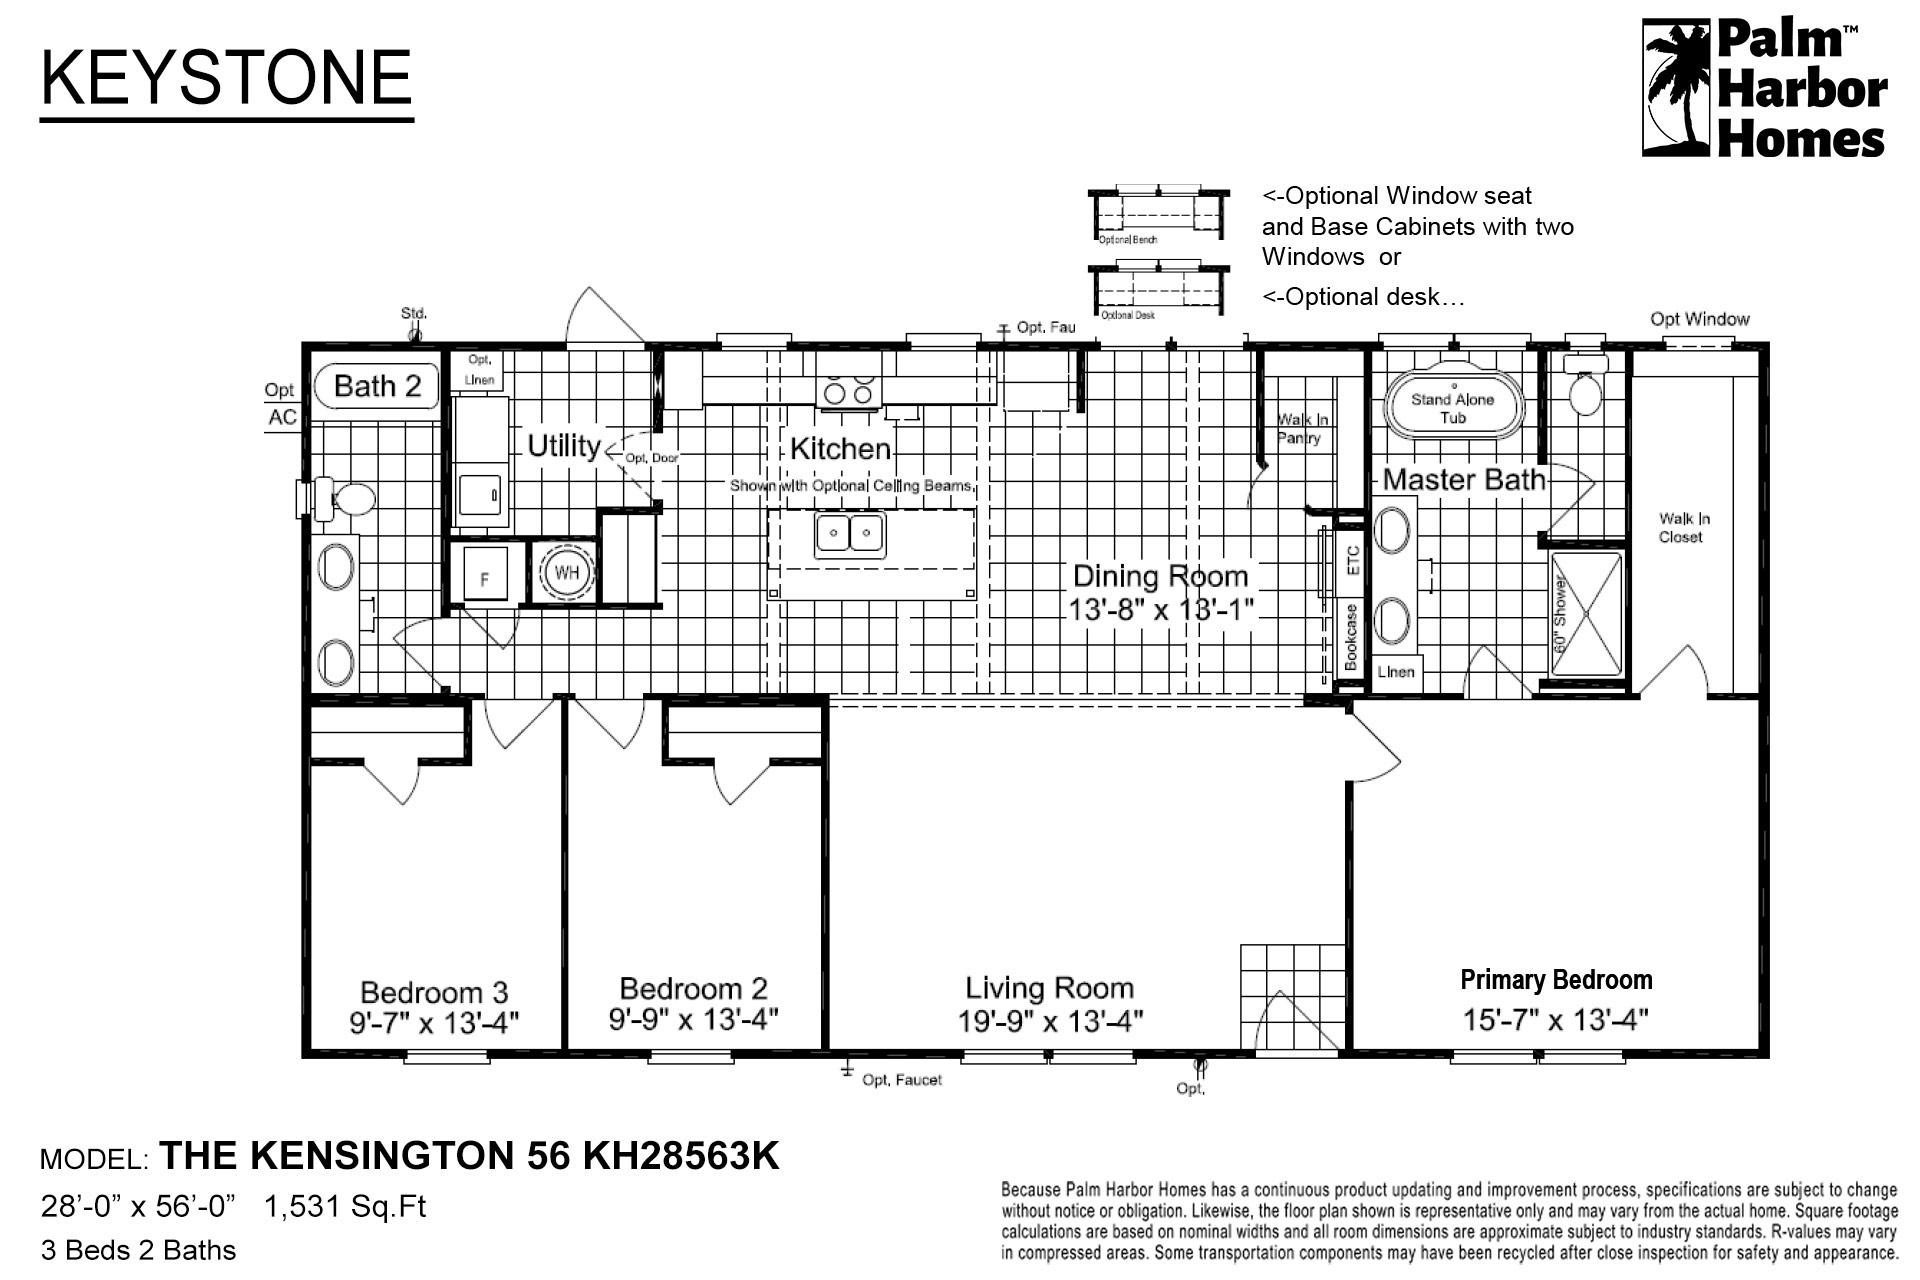 Keystone - The Kensington 56 KH28563K